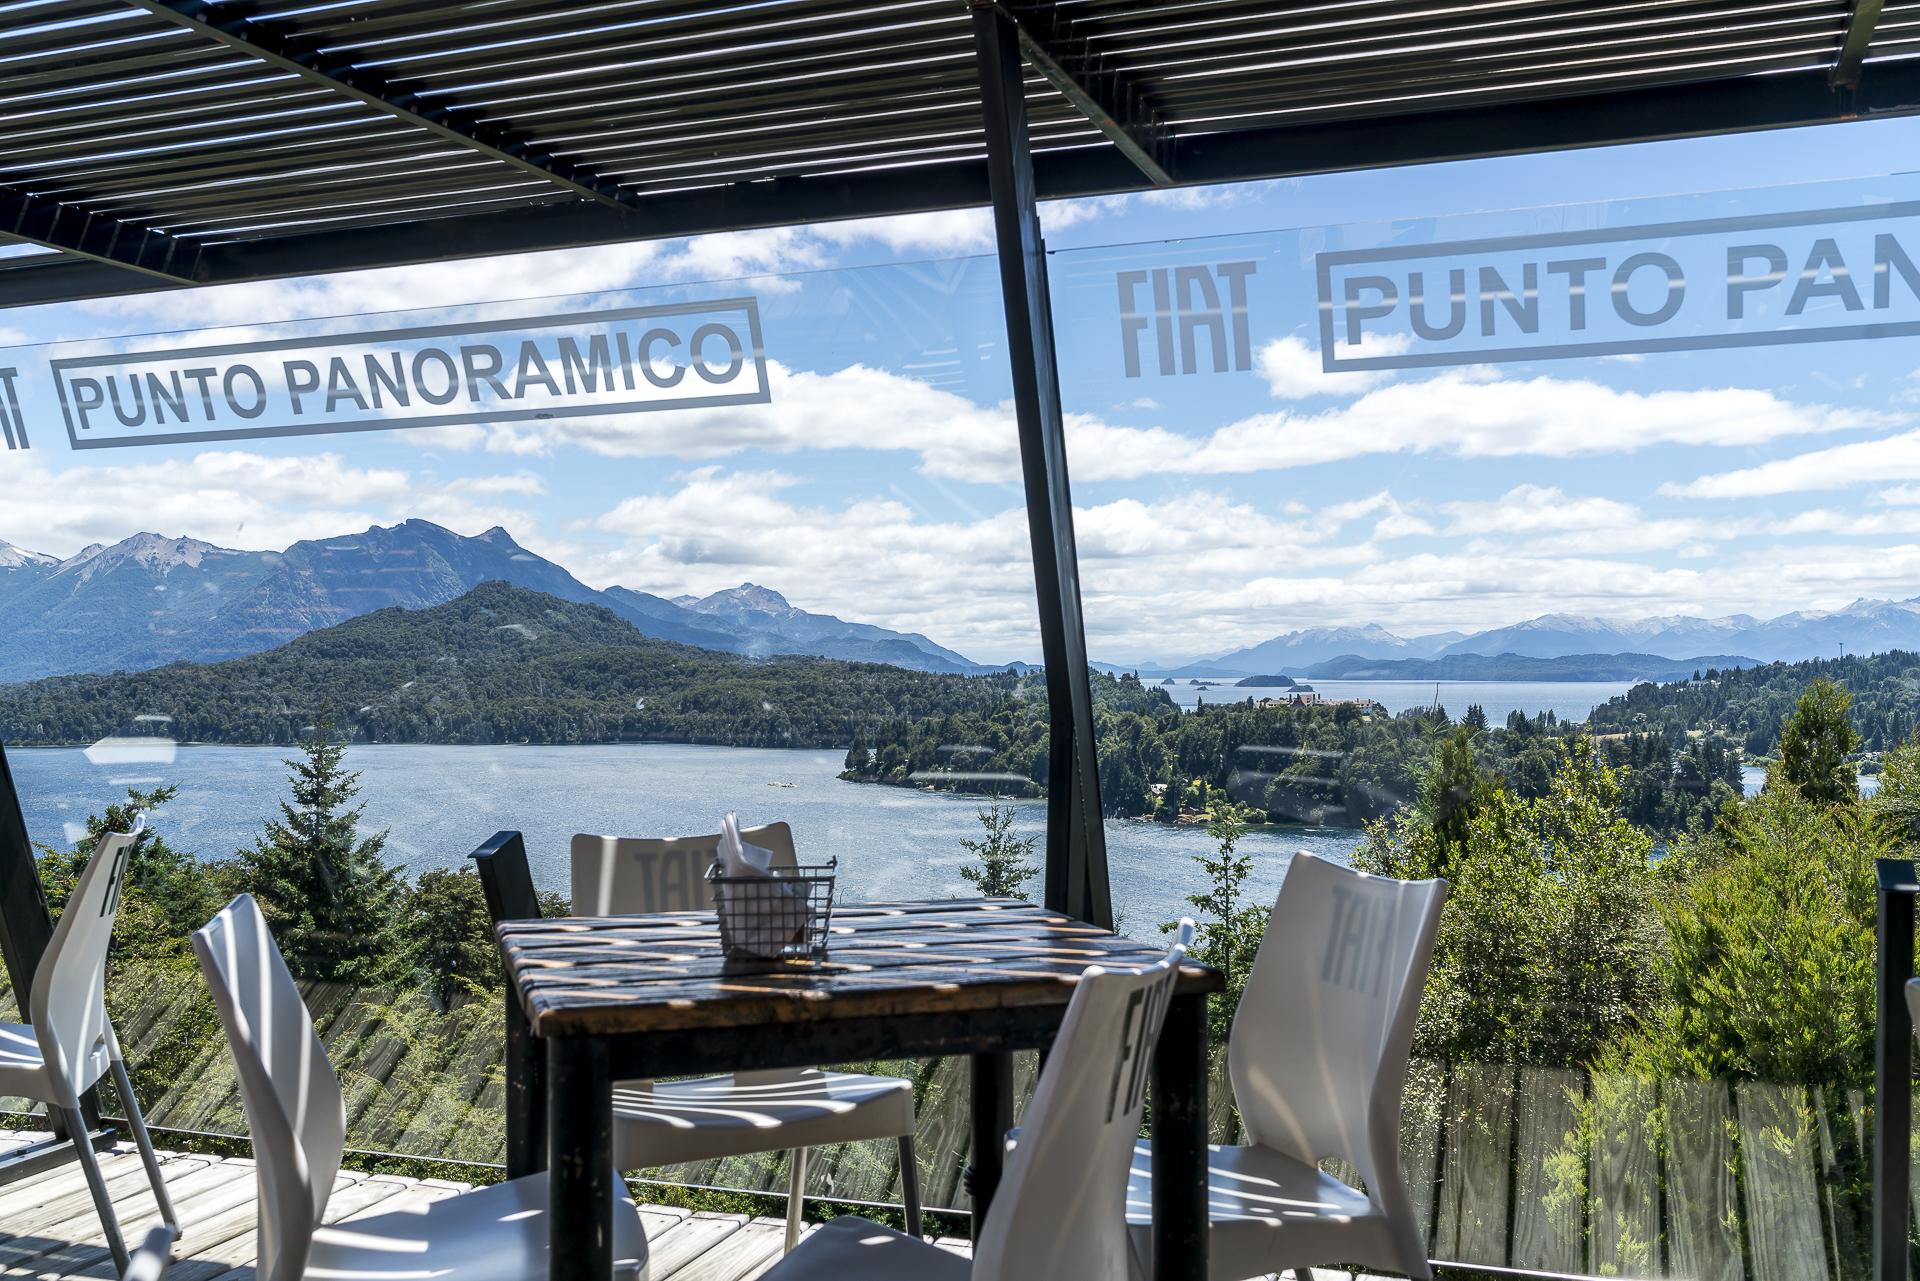 Punto Panoramico Circiuto Chico Restaurant